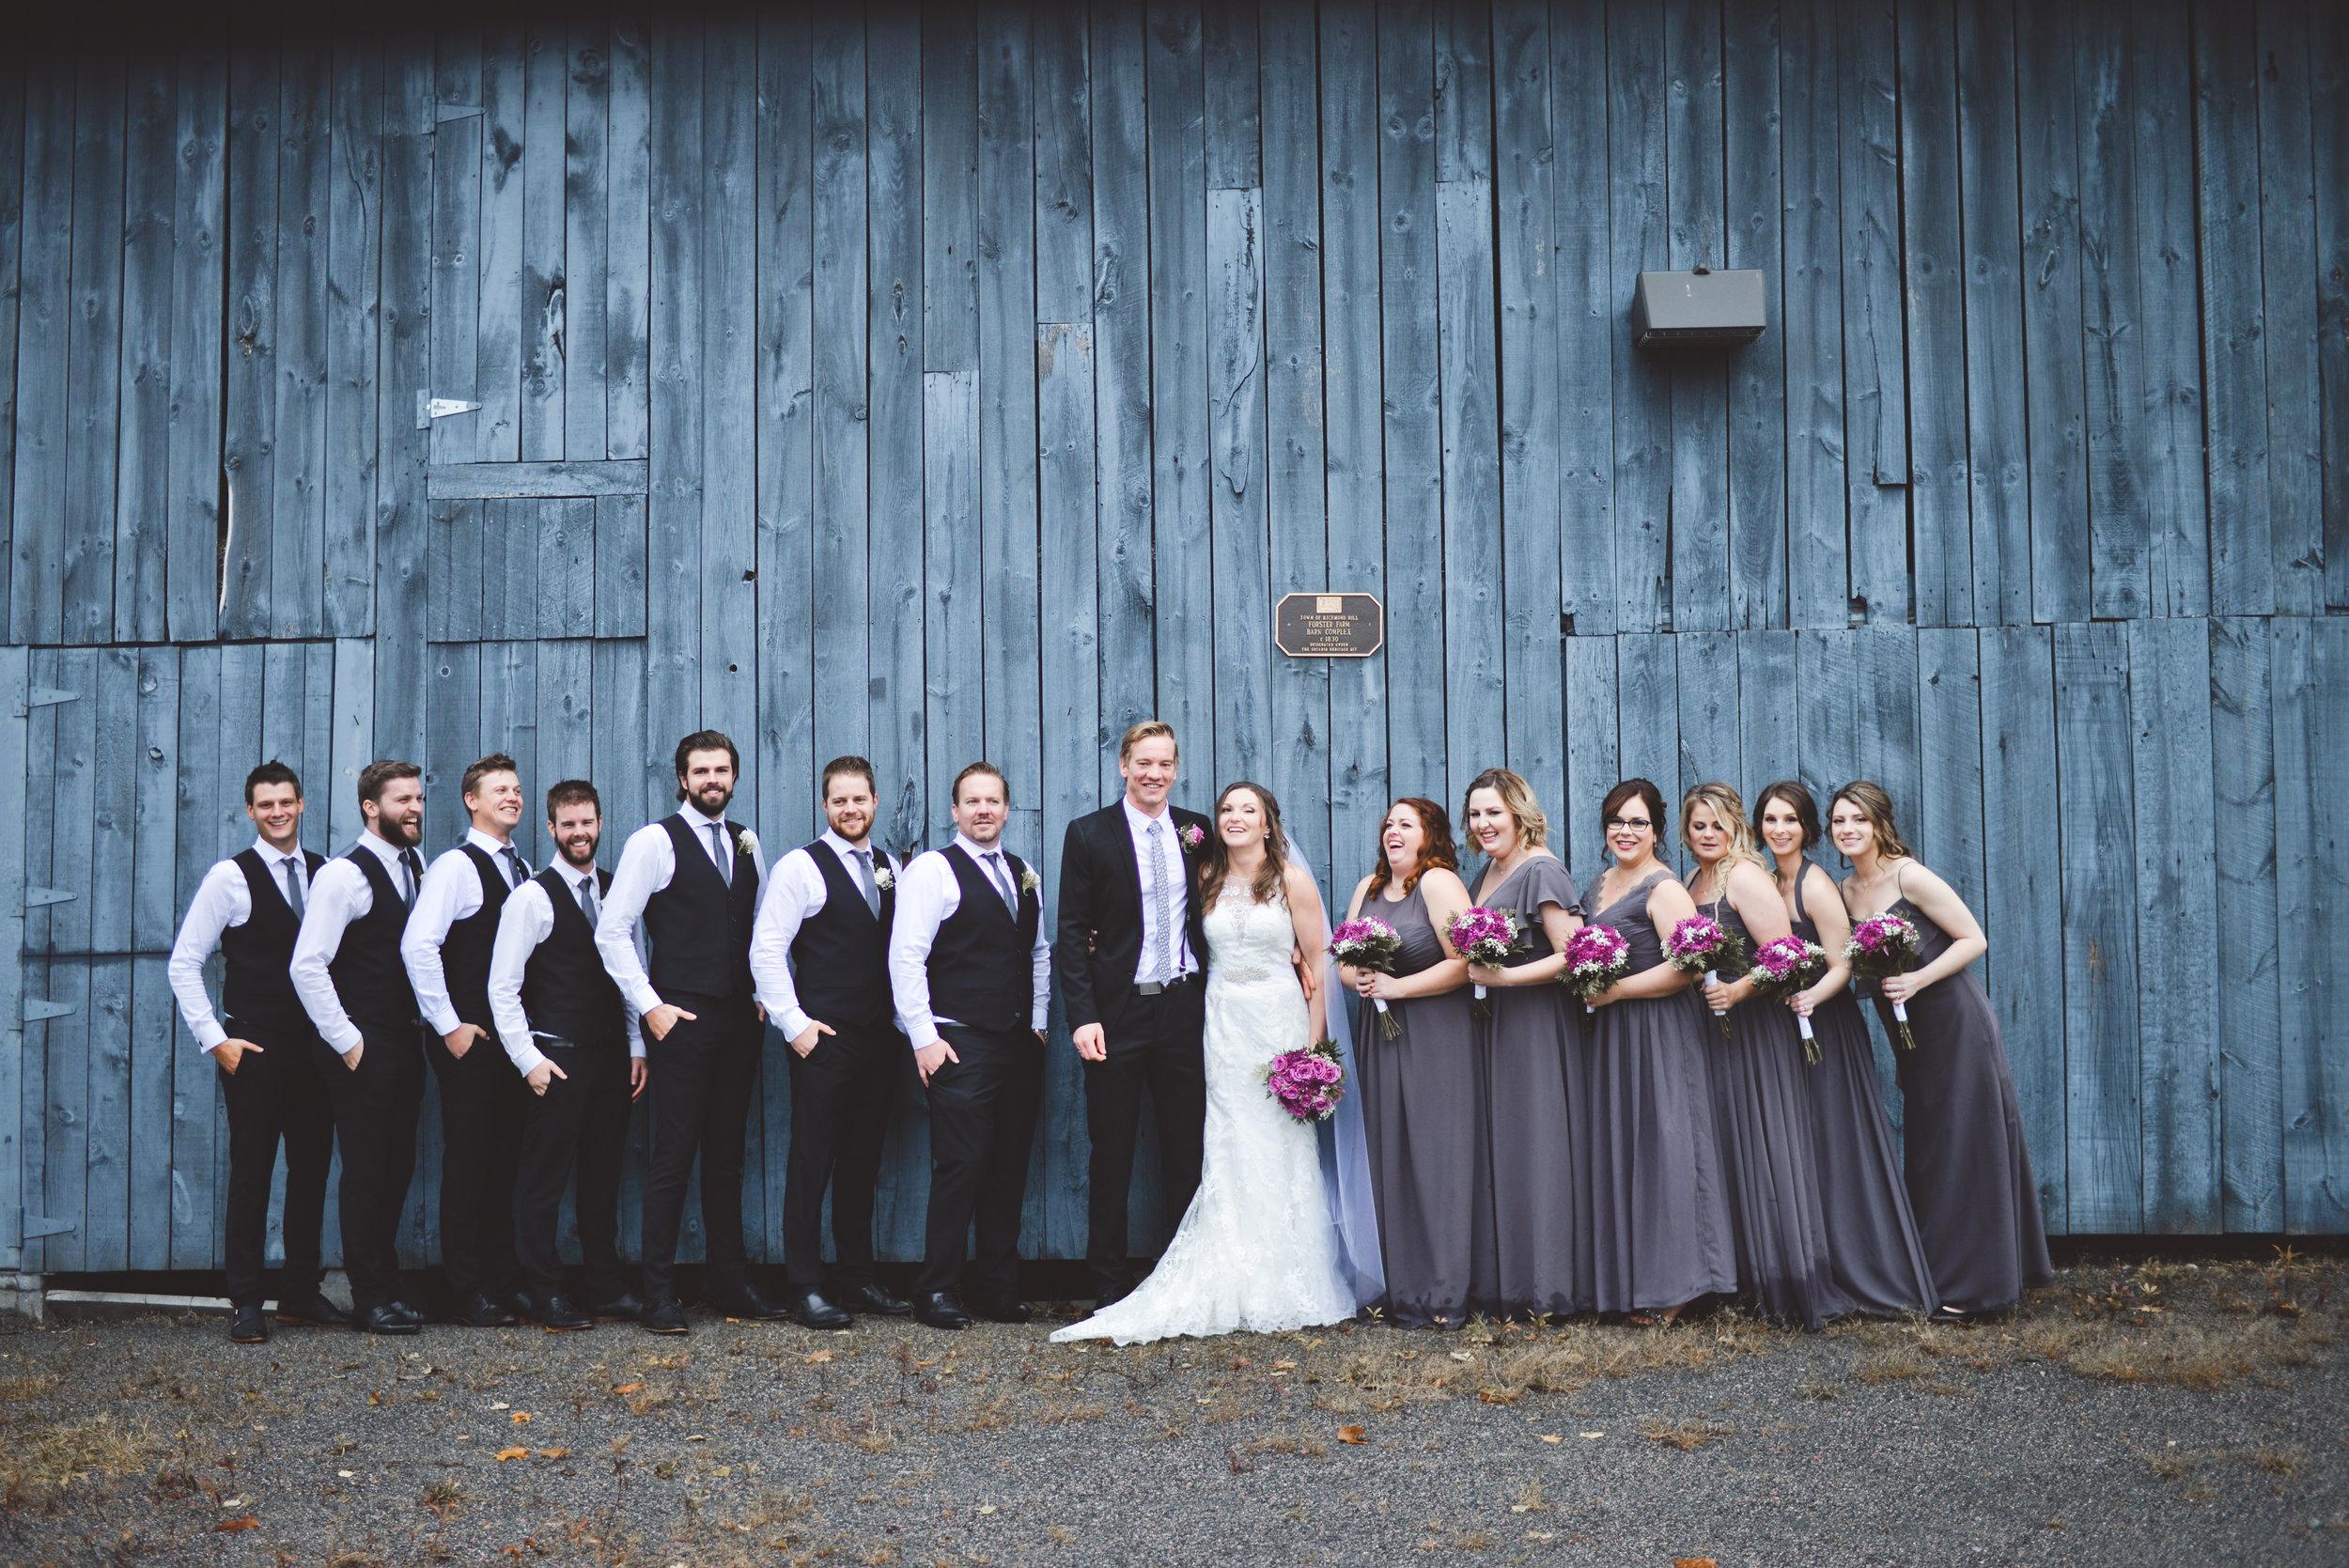 T+S - Wedding Party-2884.jpg